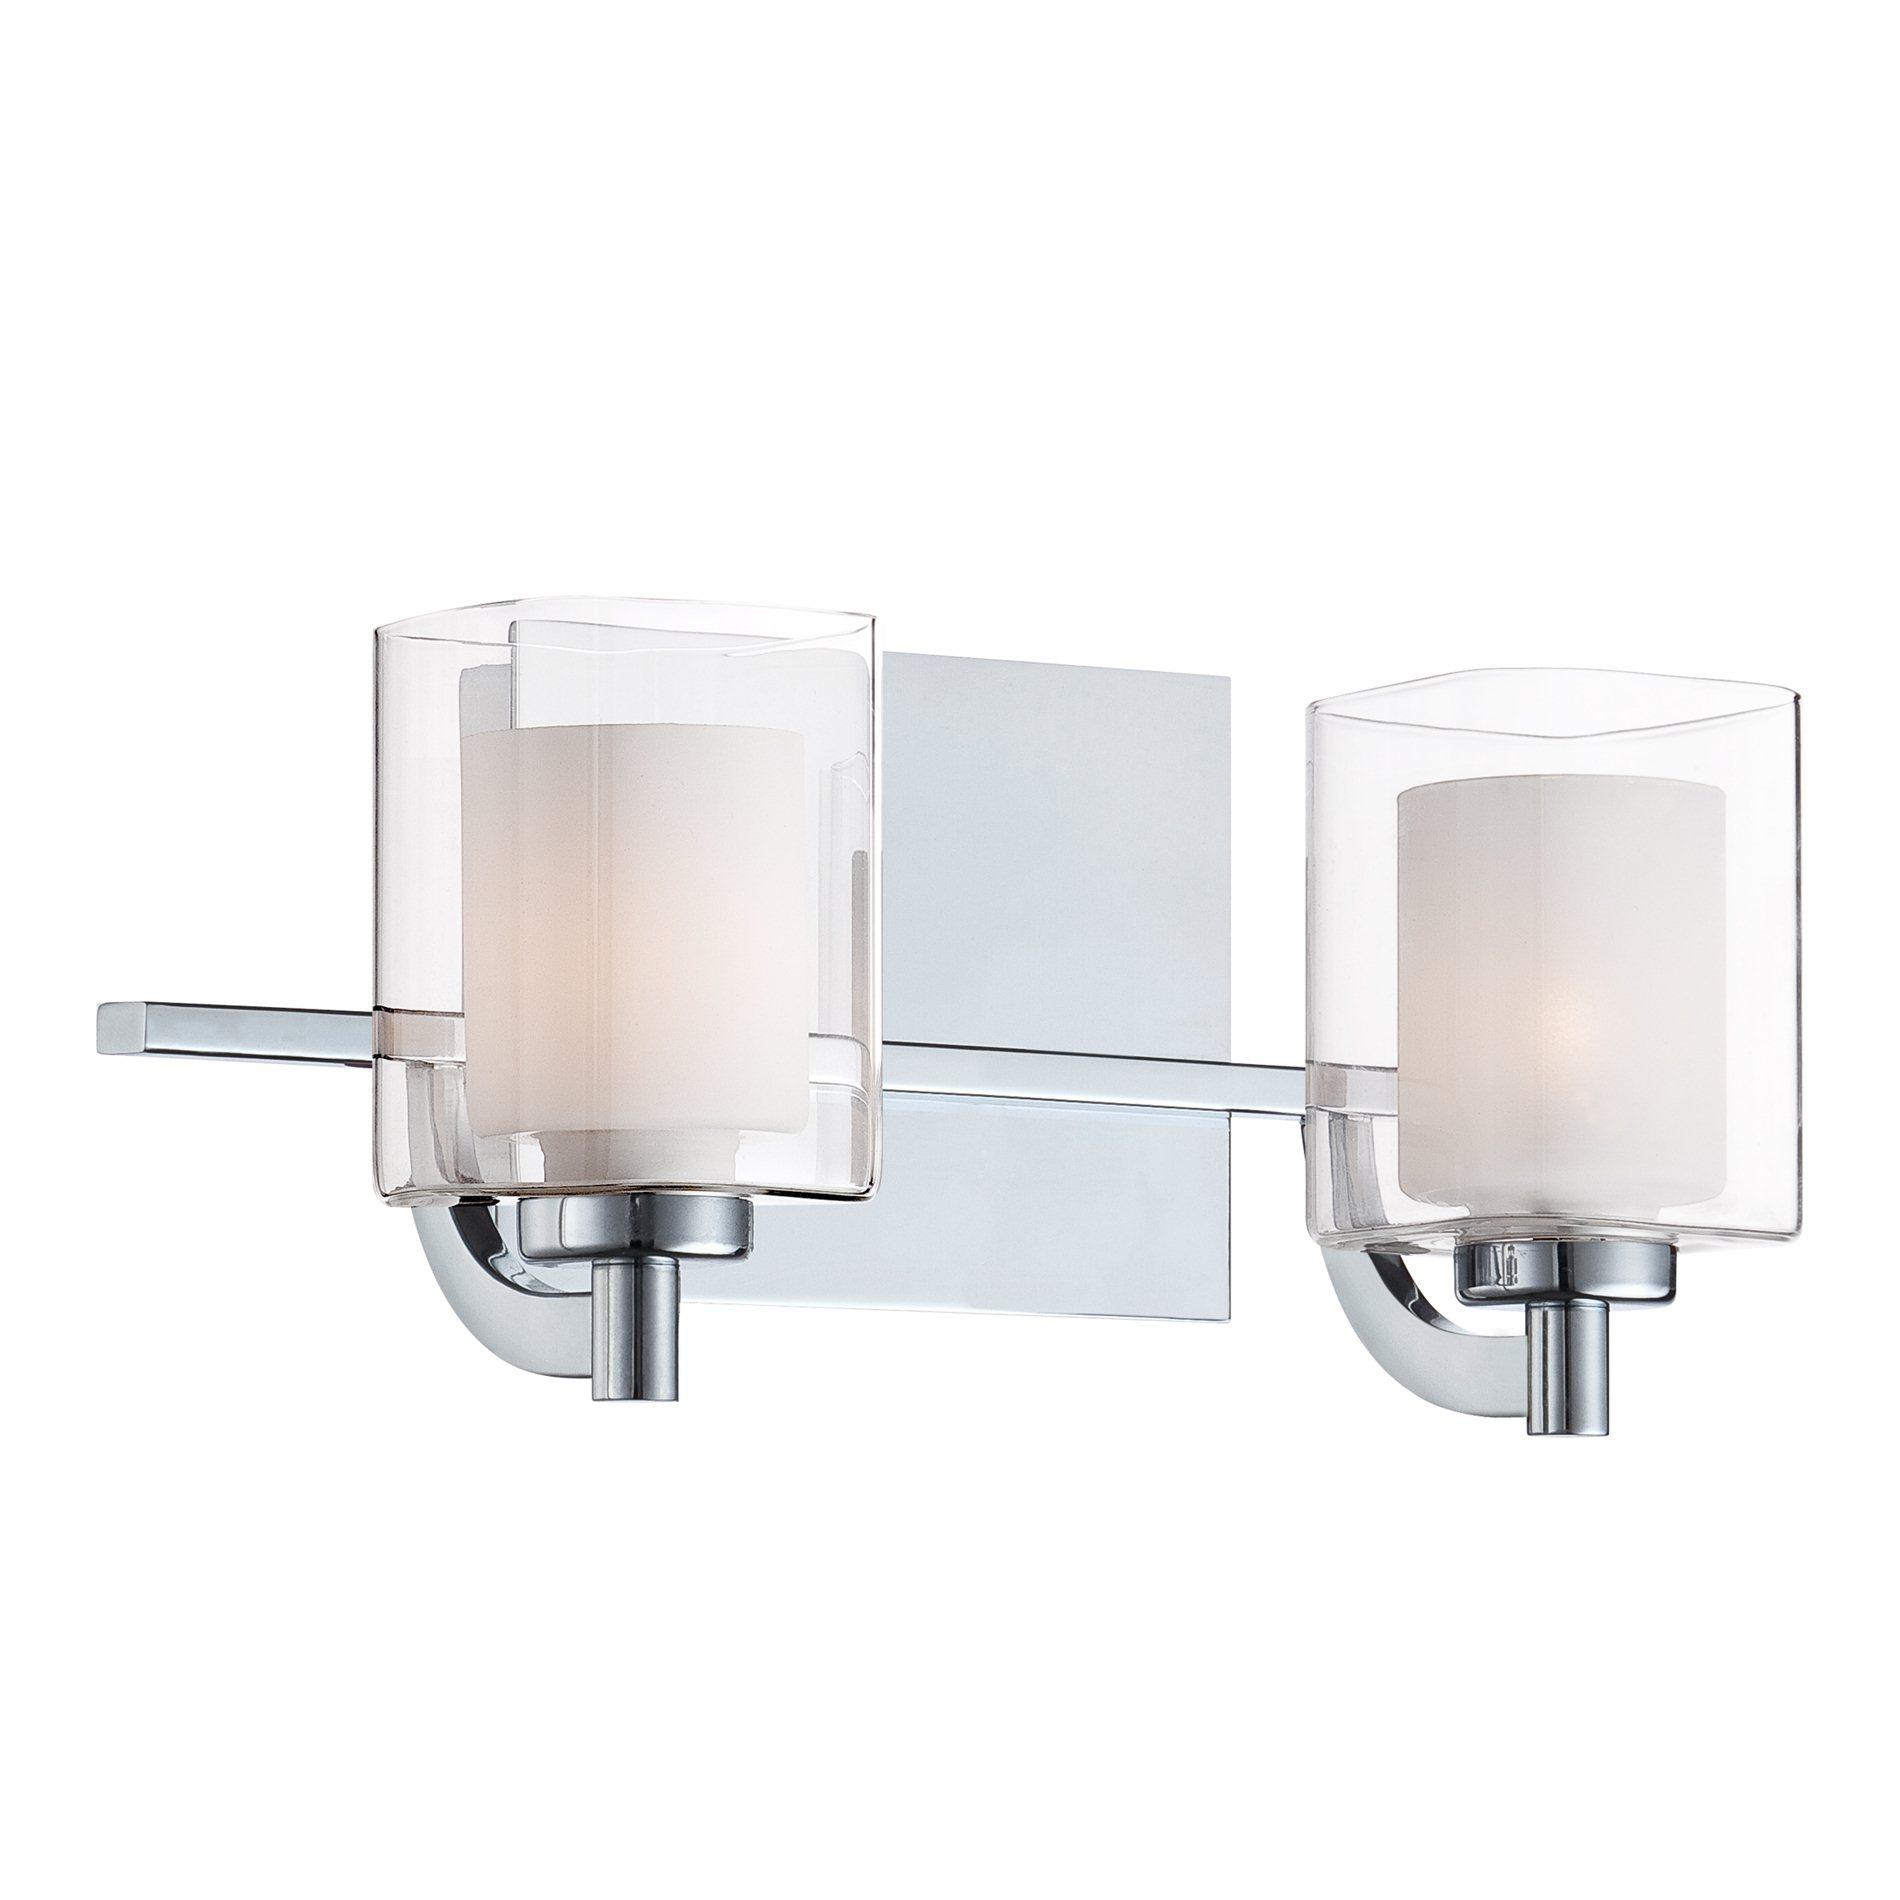 Quoizel klt8602c kolt bathroom light qz klt8602c for Quoizel bathroom lighting